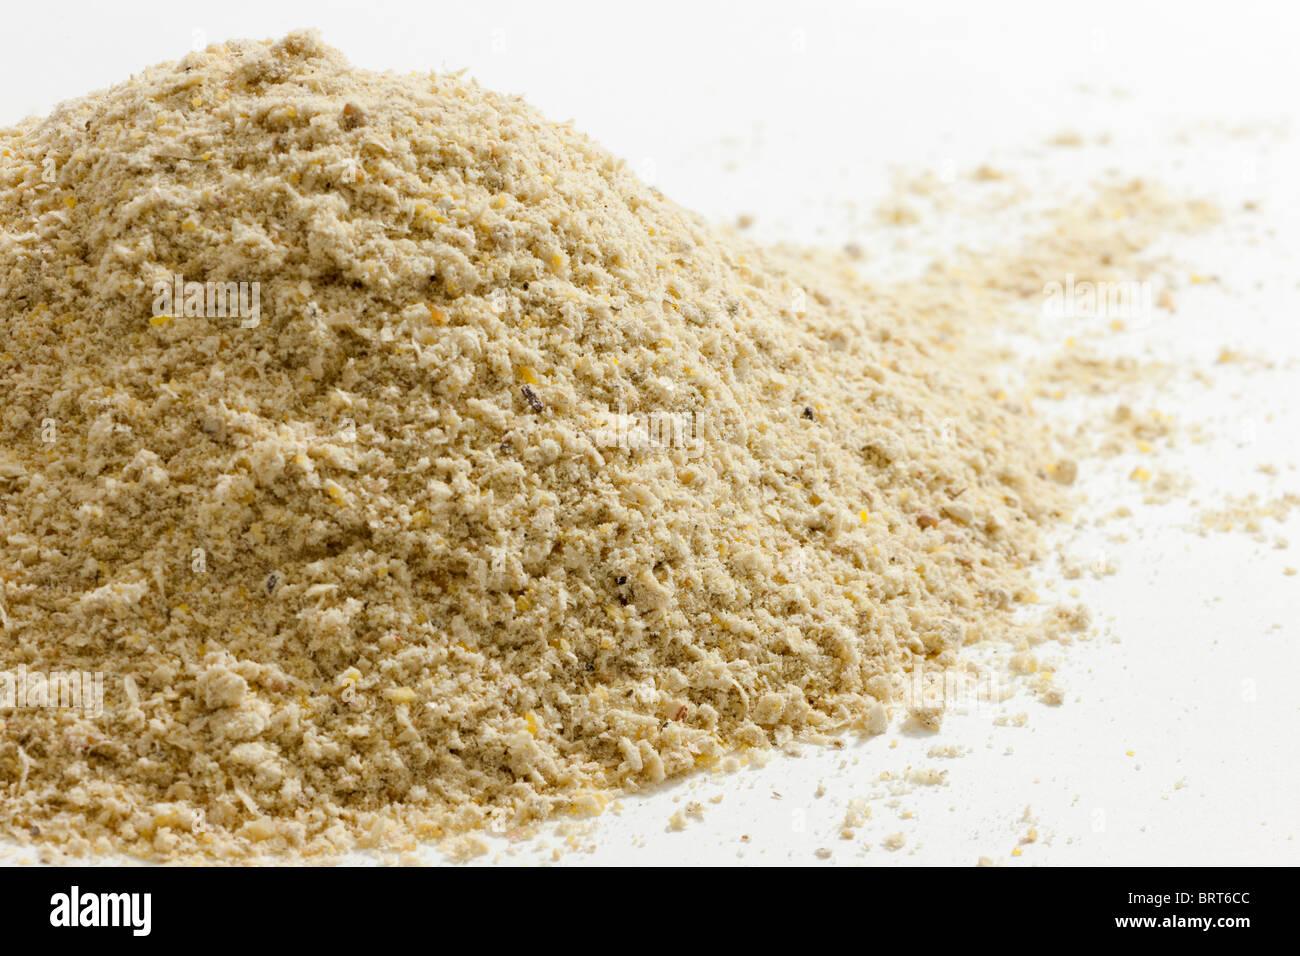 Tas de maïs moulu maizemeal Photo Stock